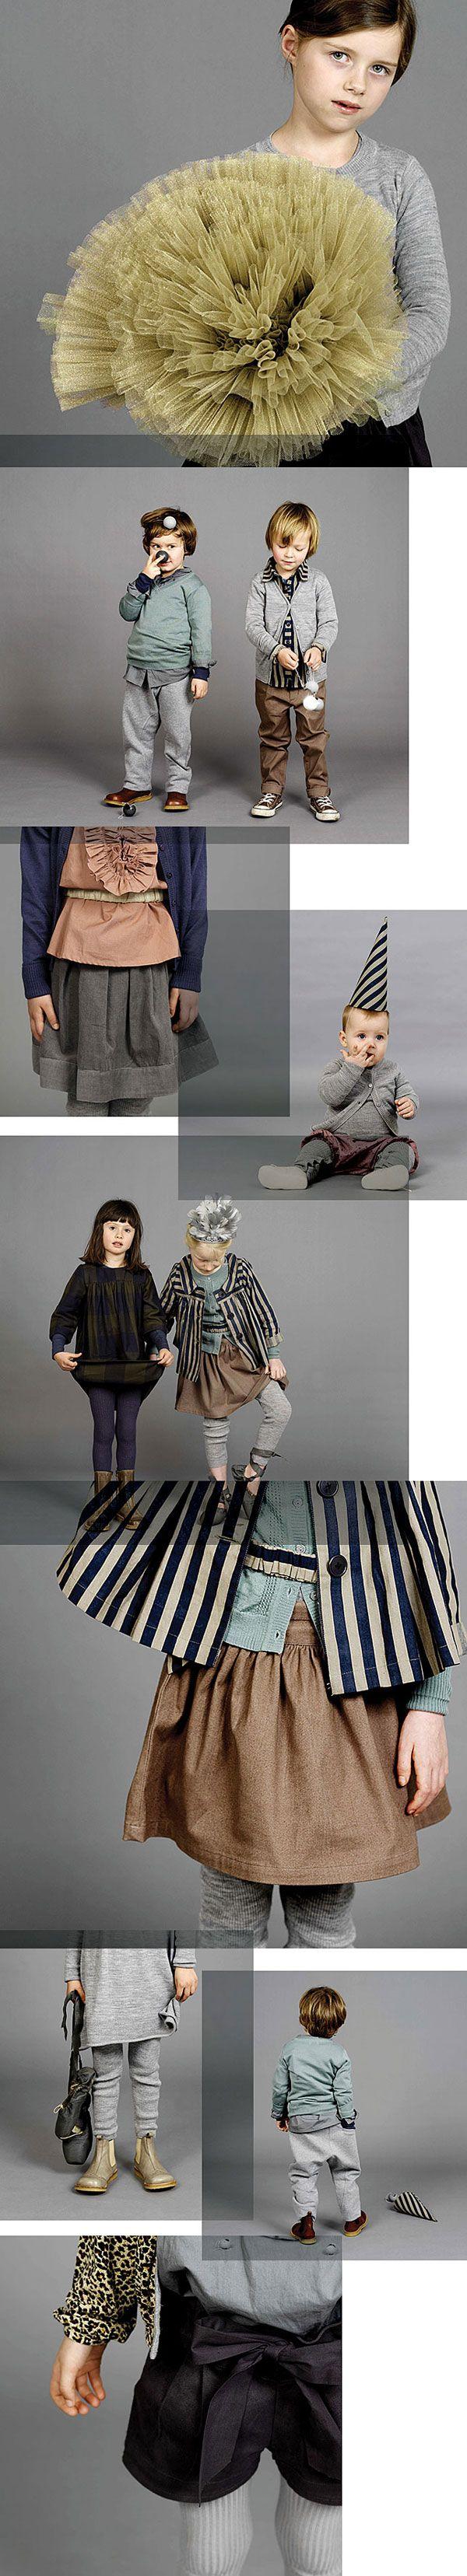 Kids can dress well too!